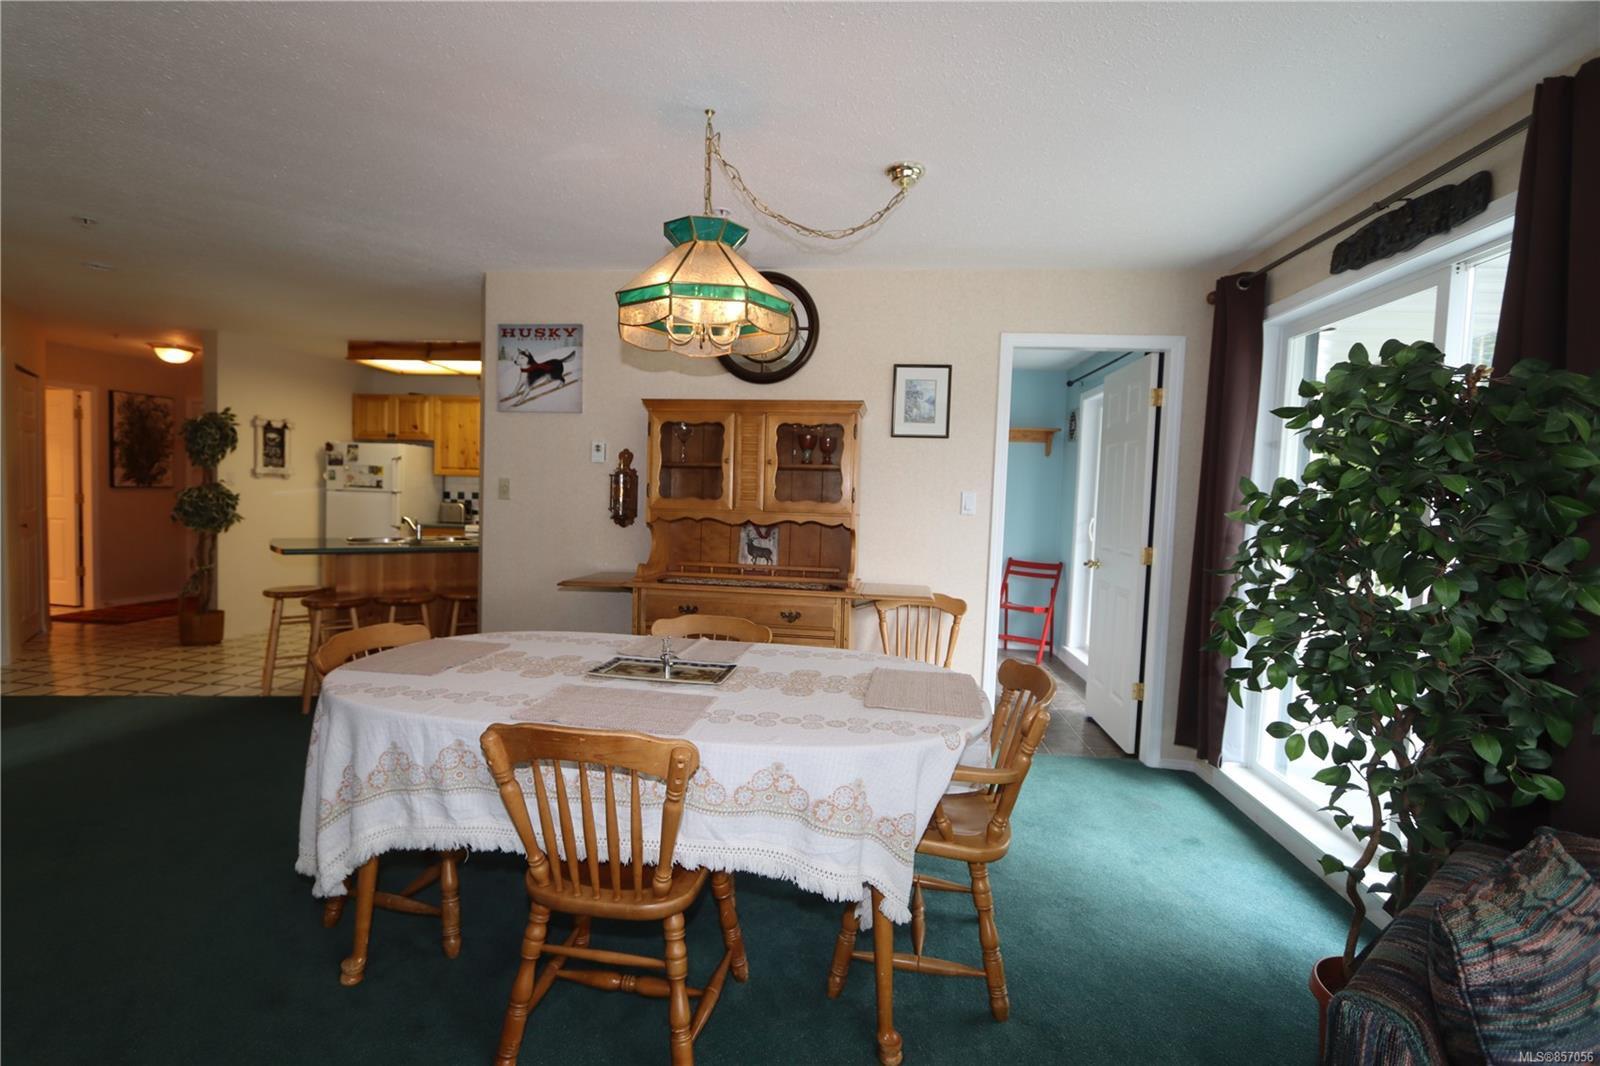 Photo 4: Photos: 118 1320 Henry Rd in : CV Mt Washington Condo for sale (Comox Valley)  : MLS®# 857056